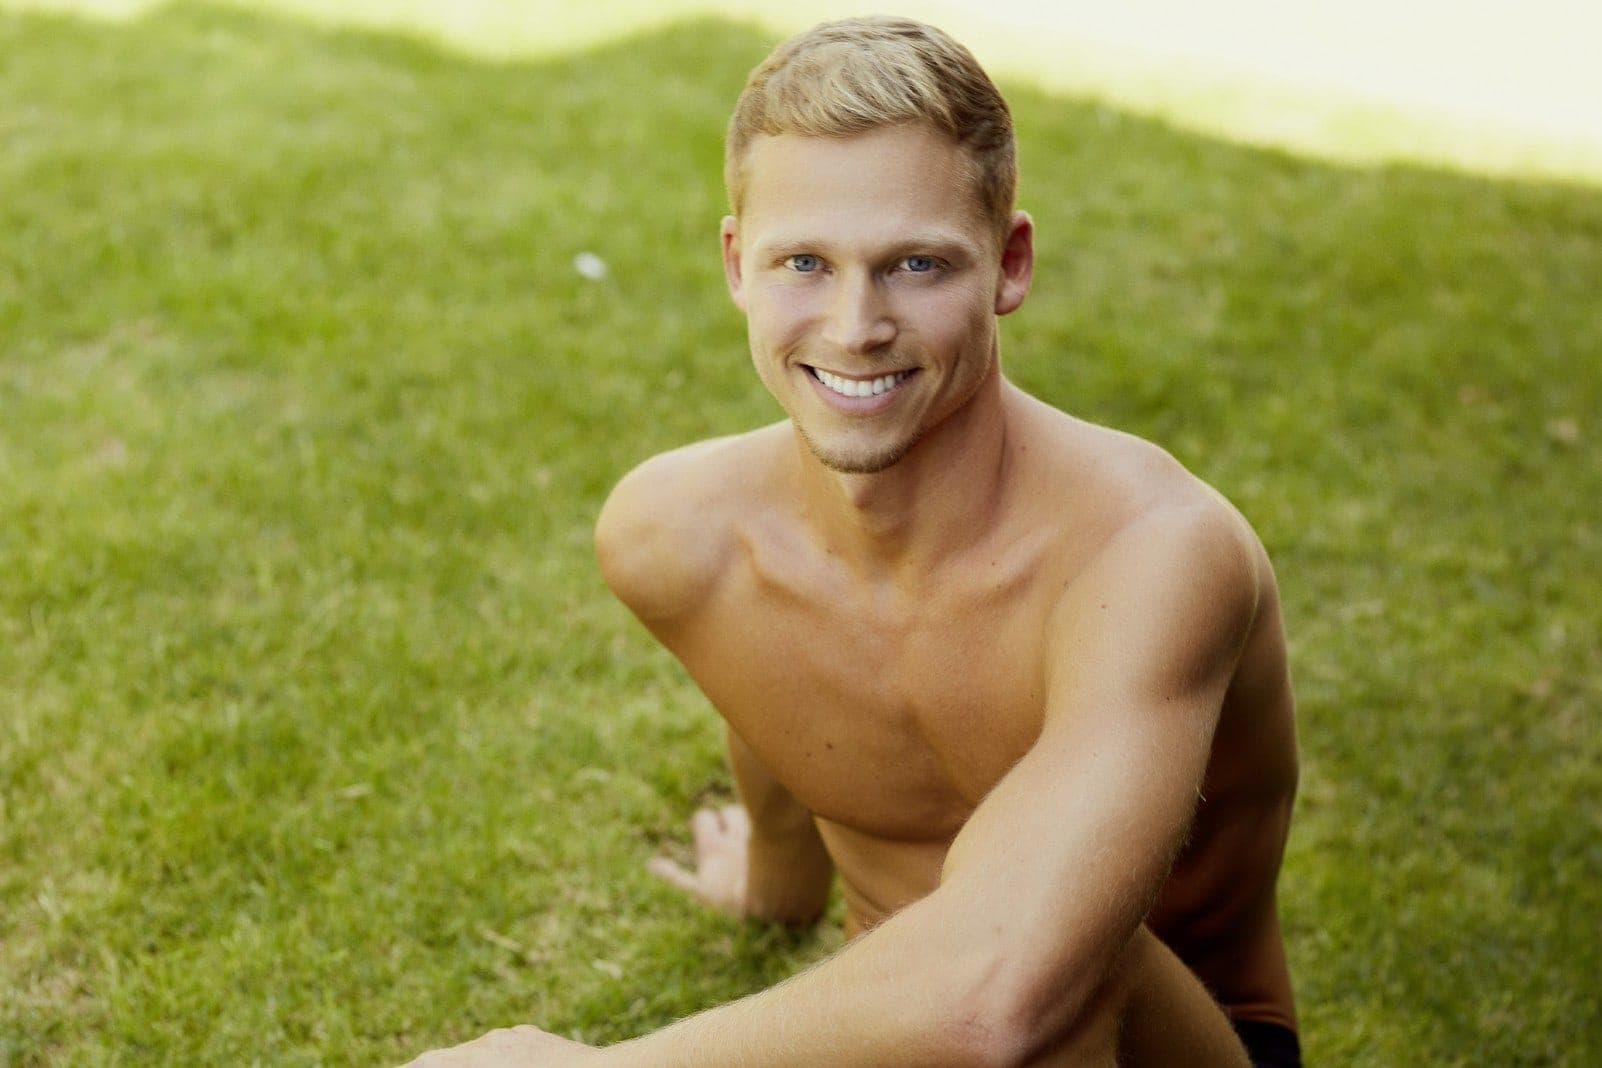 Prince-Charming-Kandidat Joachim